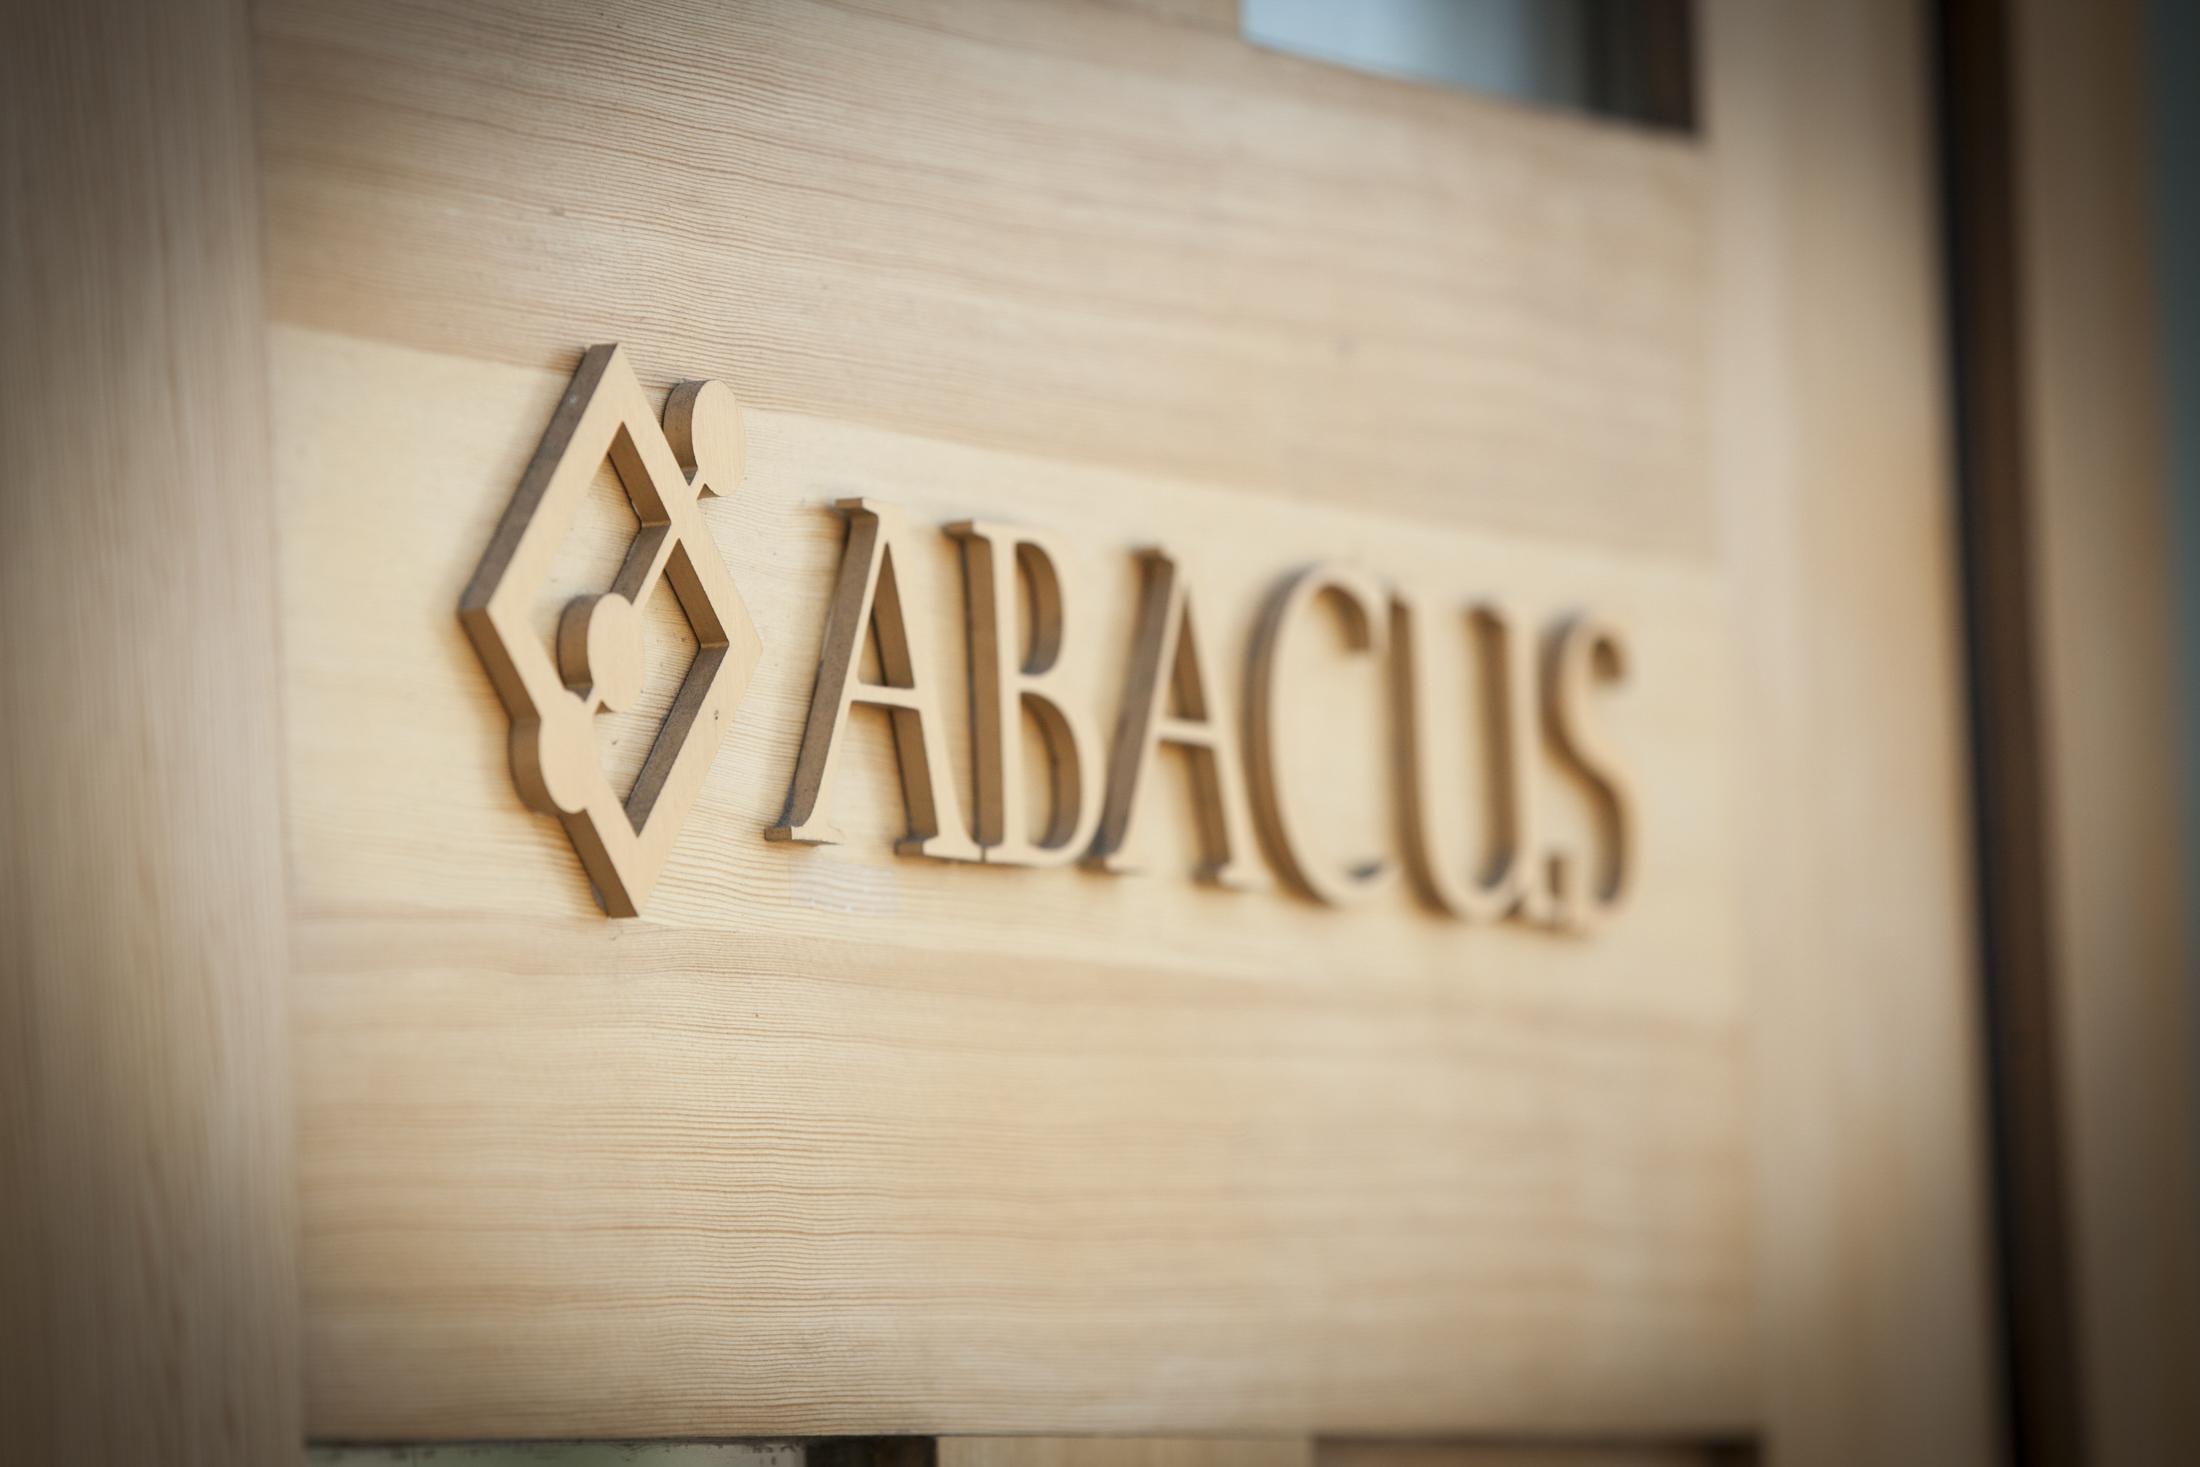 1-176-Exterior-abacus18-6693-2.jpg